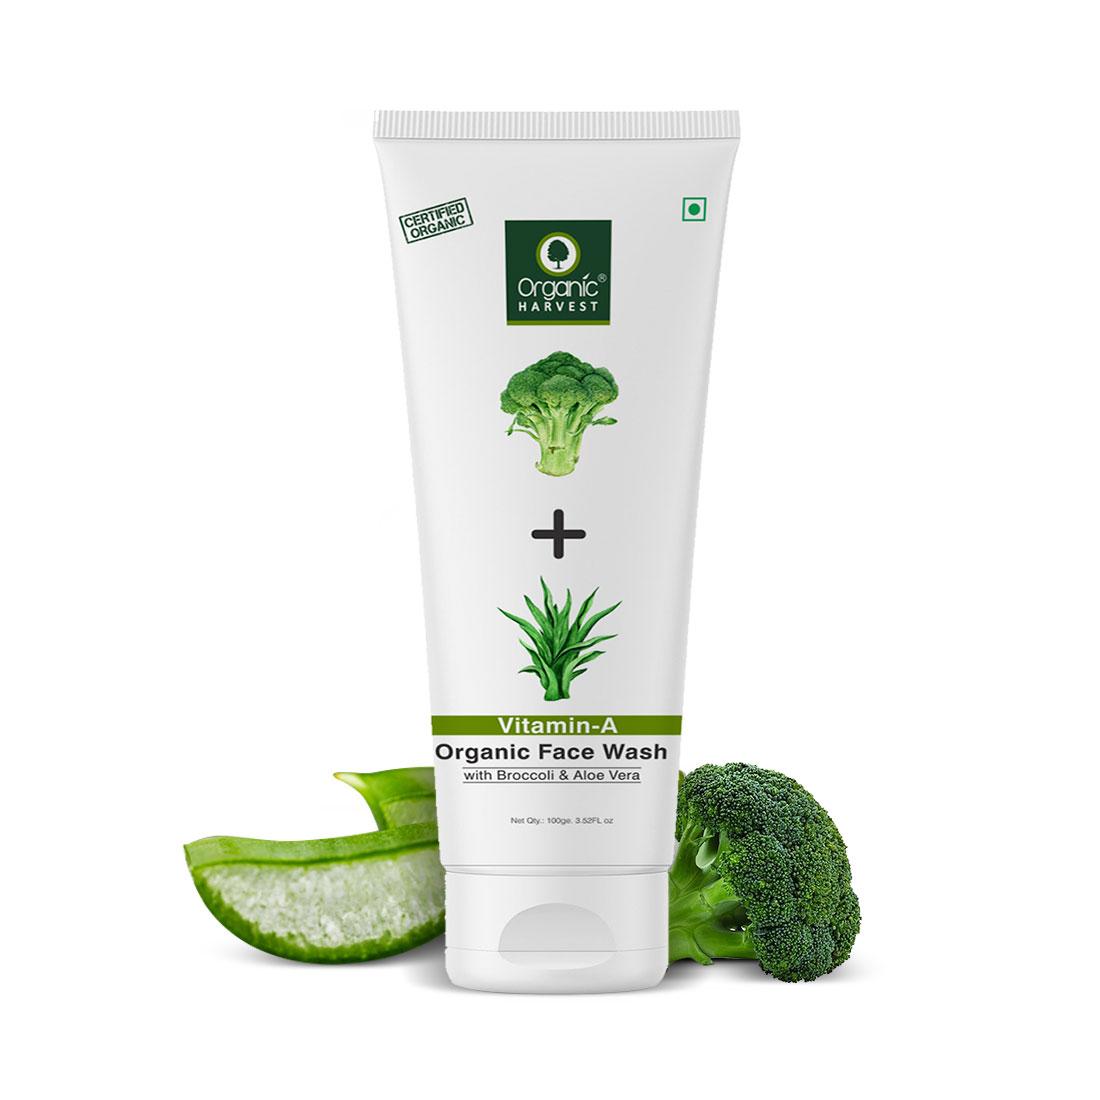 Organic Harvest | Face Wash - Vitamin-A